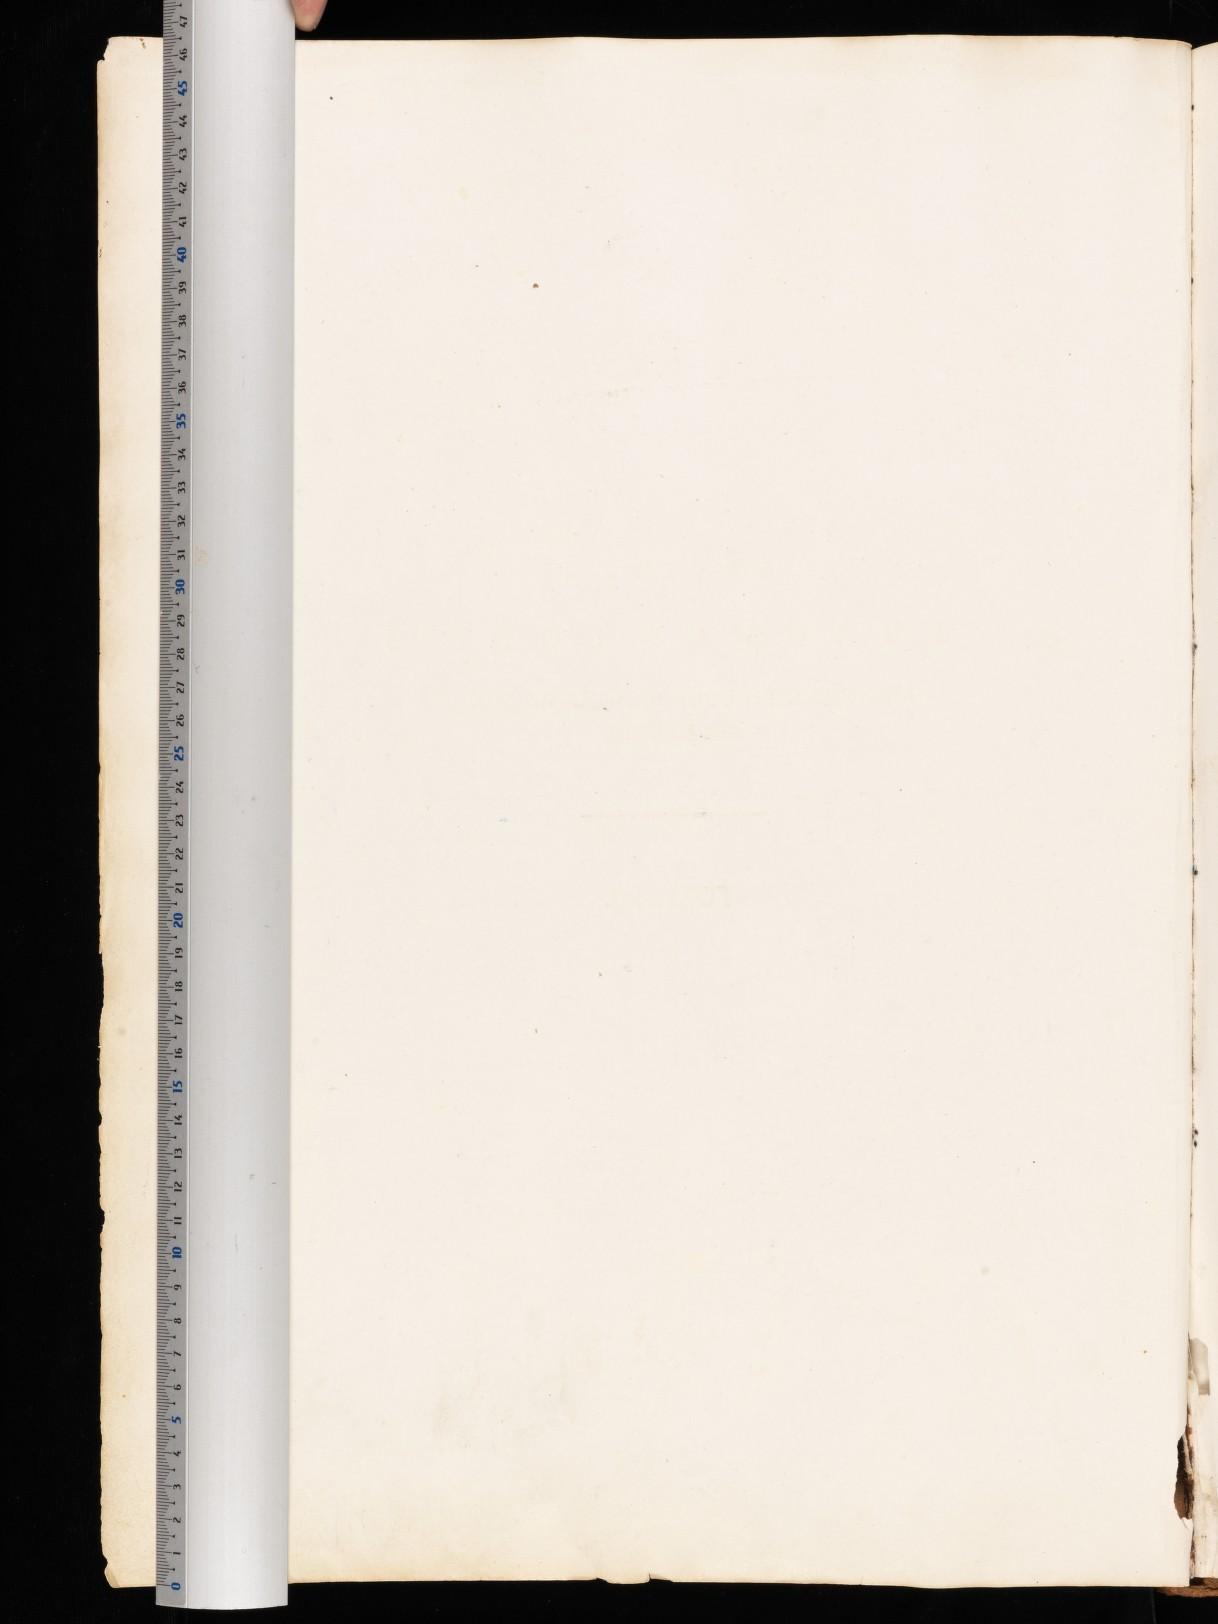 Cod. Sang. 1394, bindingRulerS